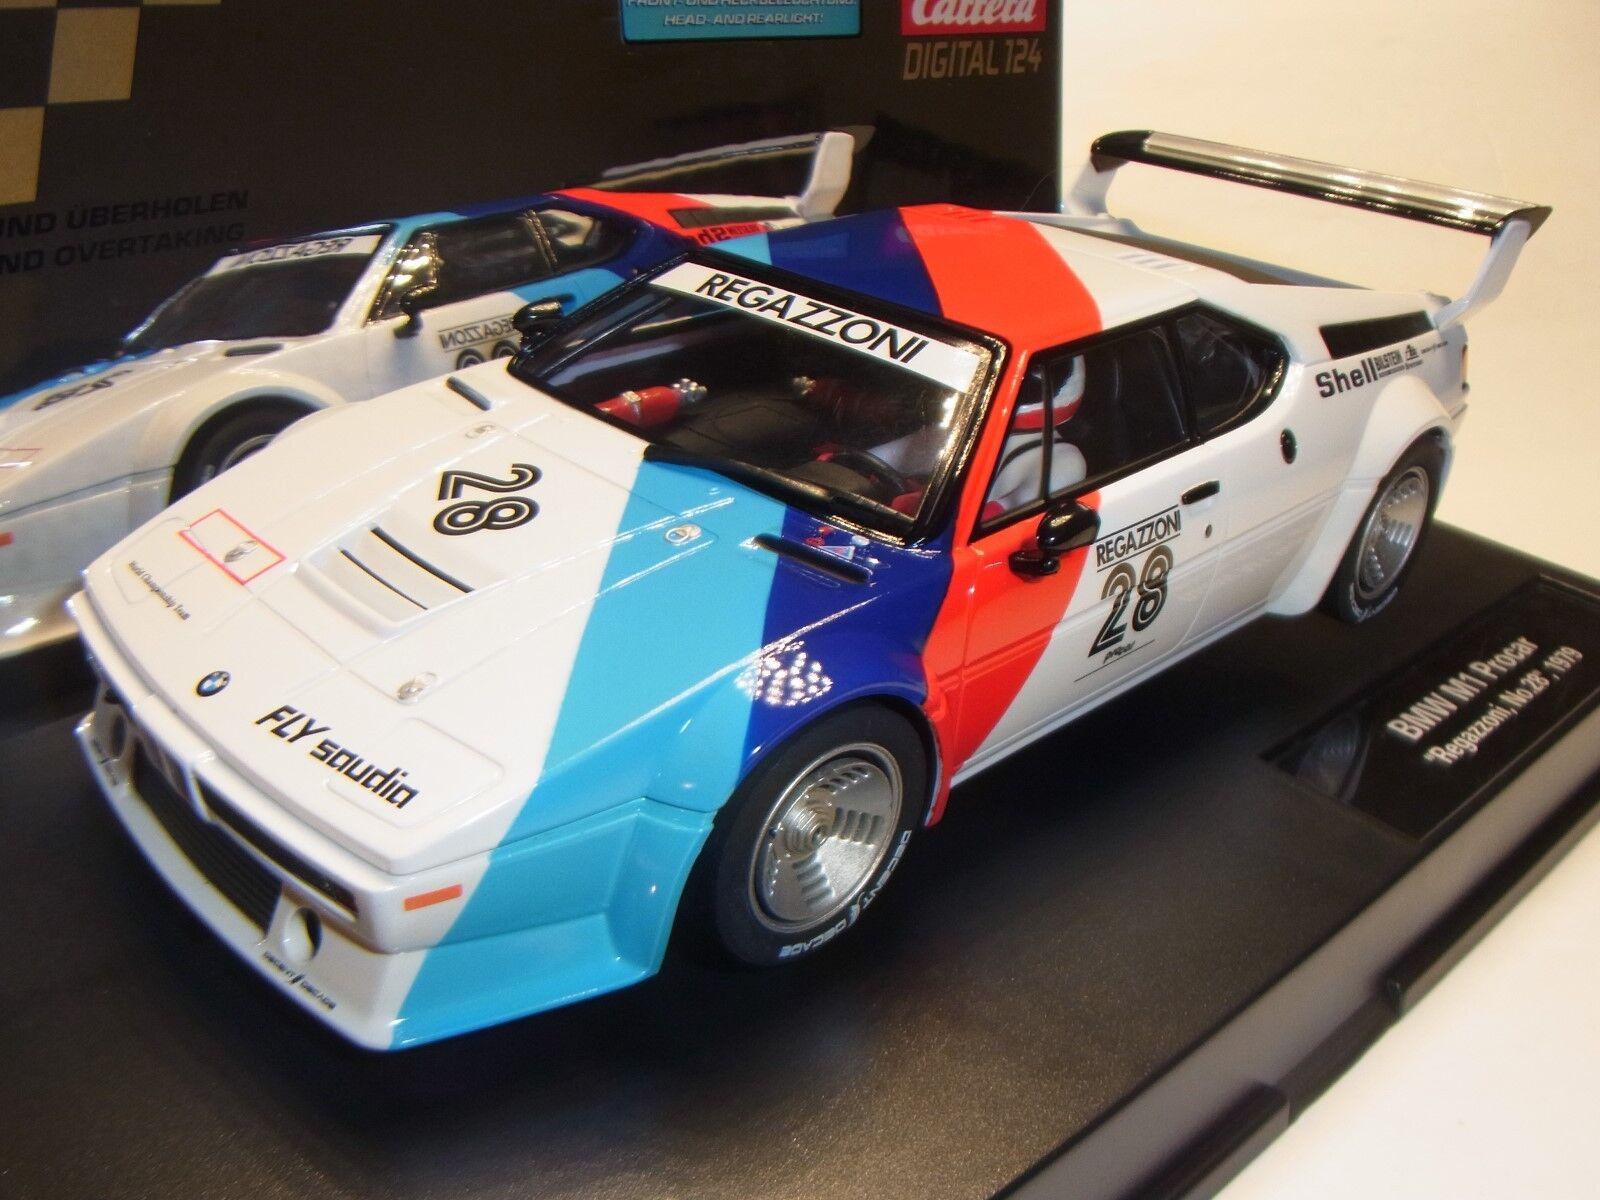 Carrera Digital 1 24 BMW M1 Procar Regazzoni 1979 CAR23820 Slotcar